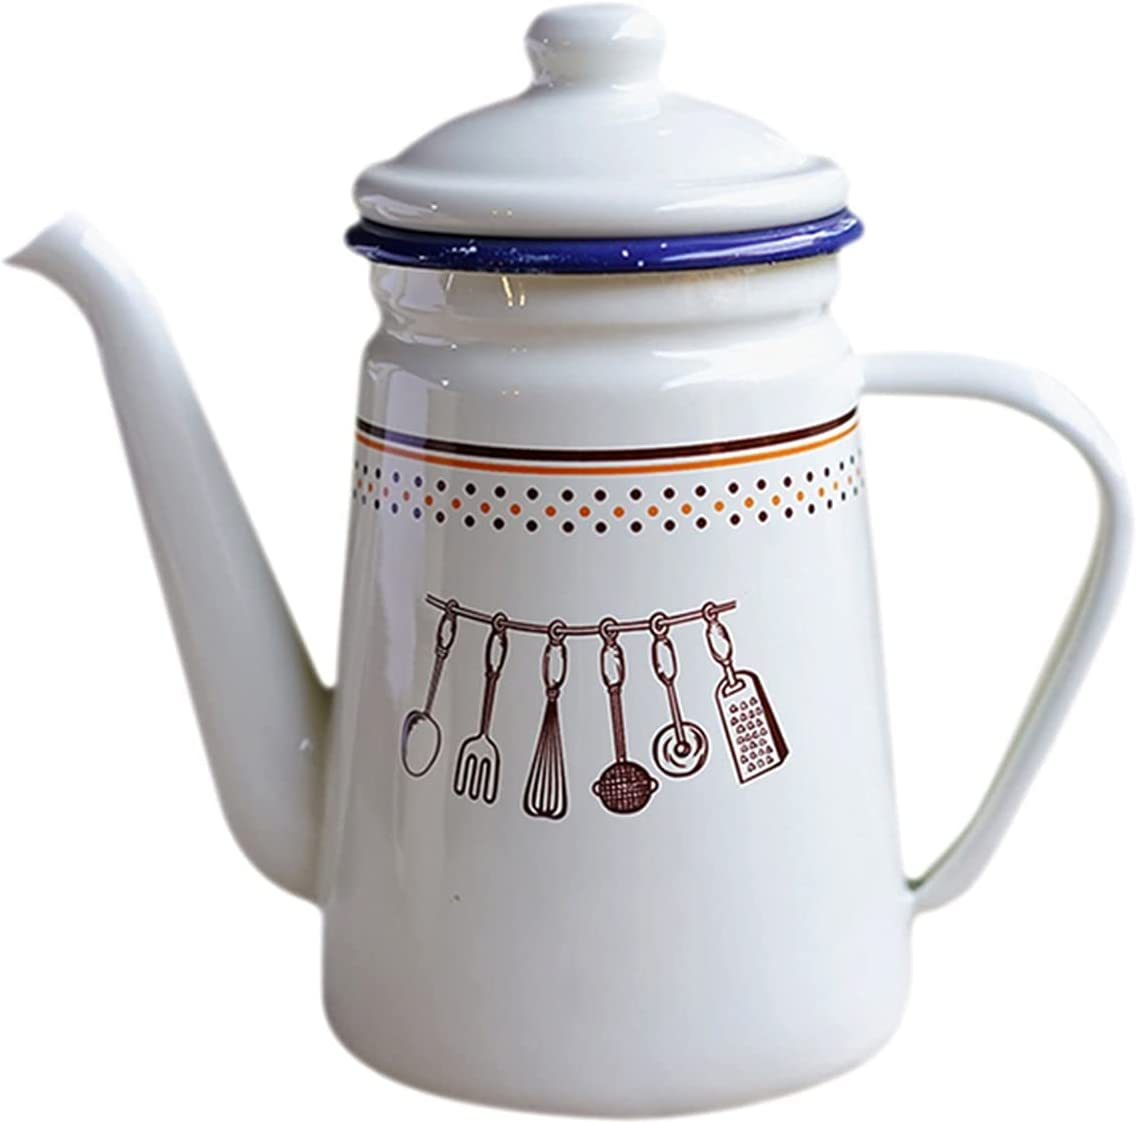 hongbanlemp Coffee Kettle Coffee Pot Enamel Household Hand-Made